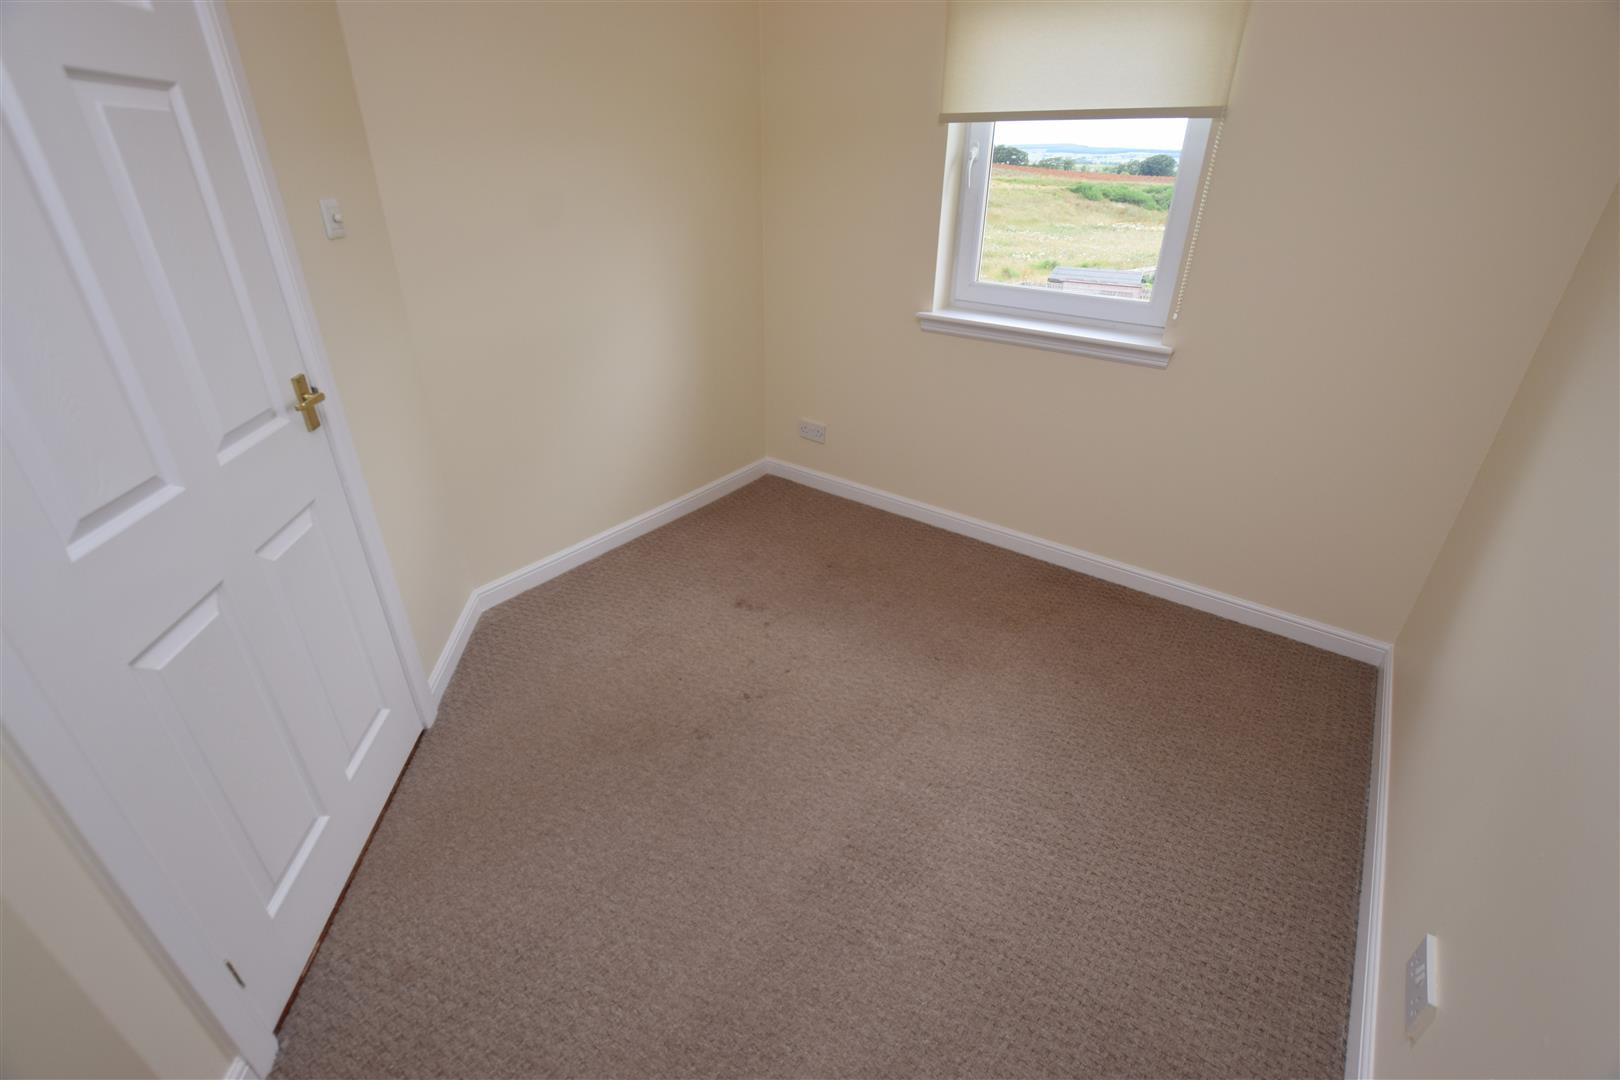 14, Corum Place, Blackford, Blackford Auchterarder, Perthshire, PH4 1PU, UK